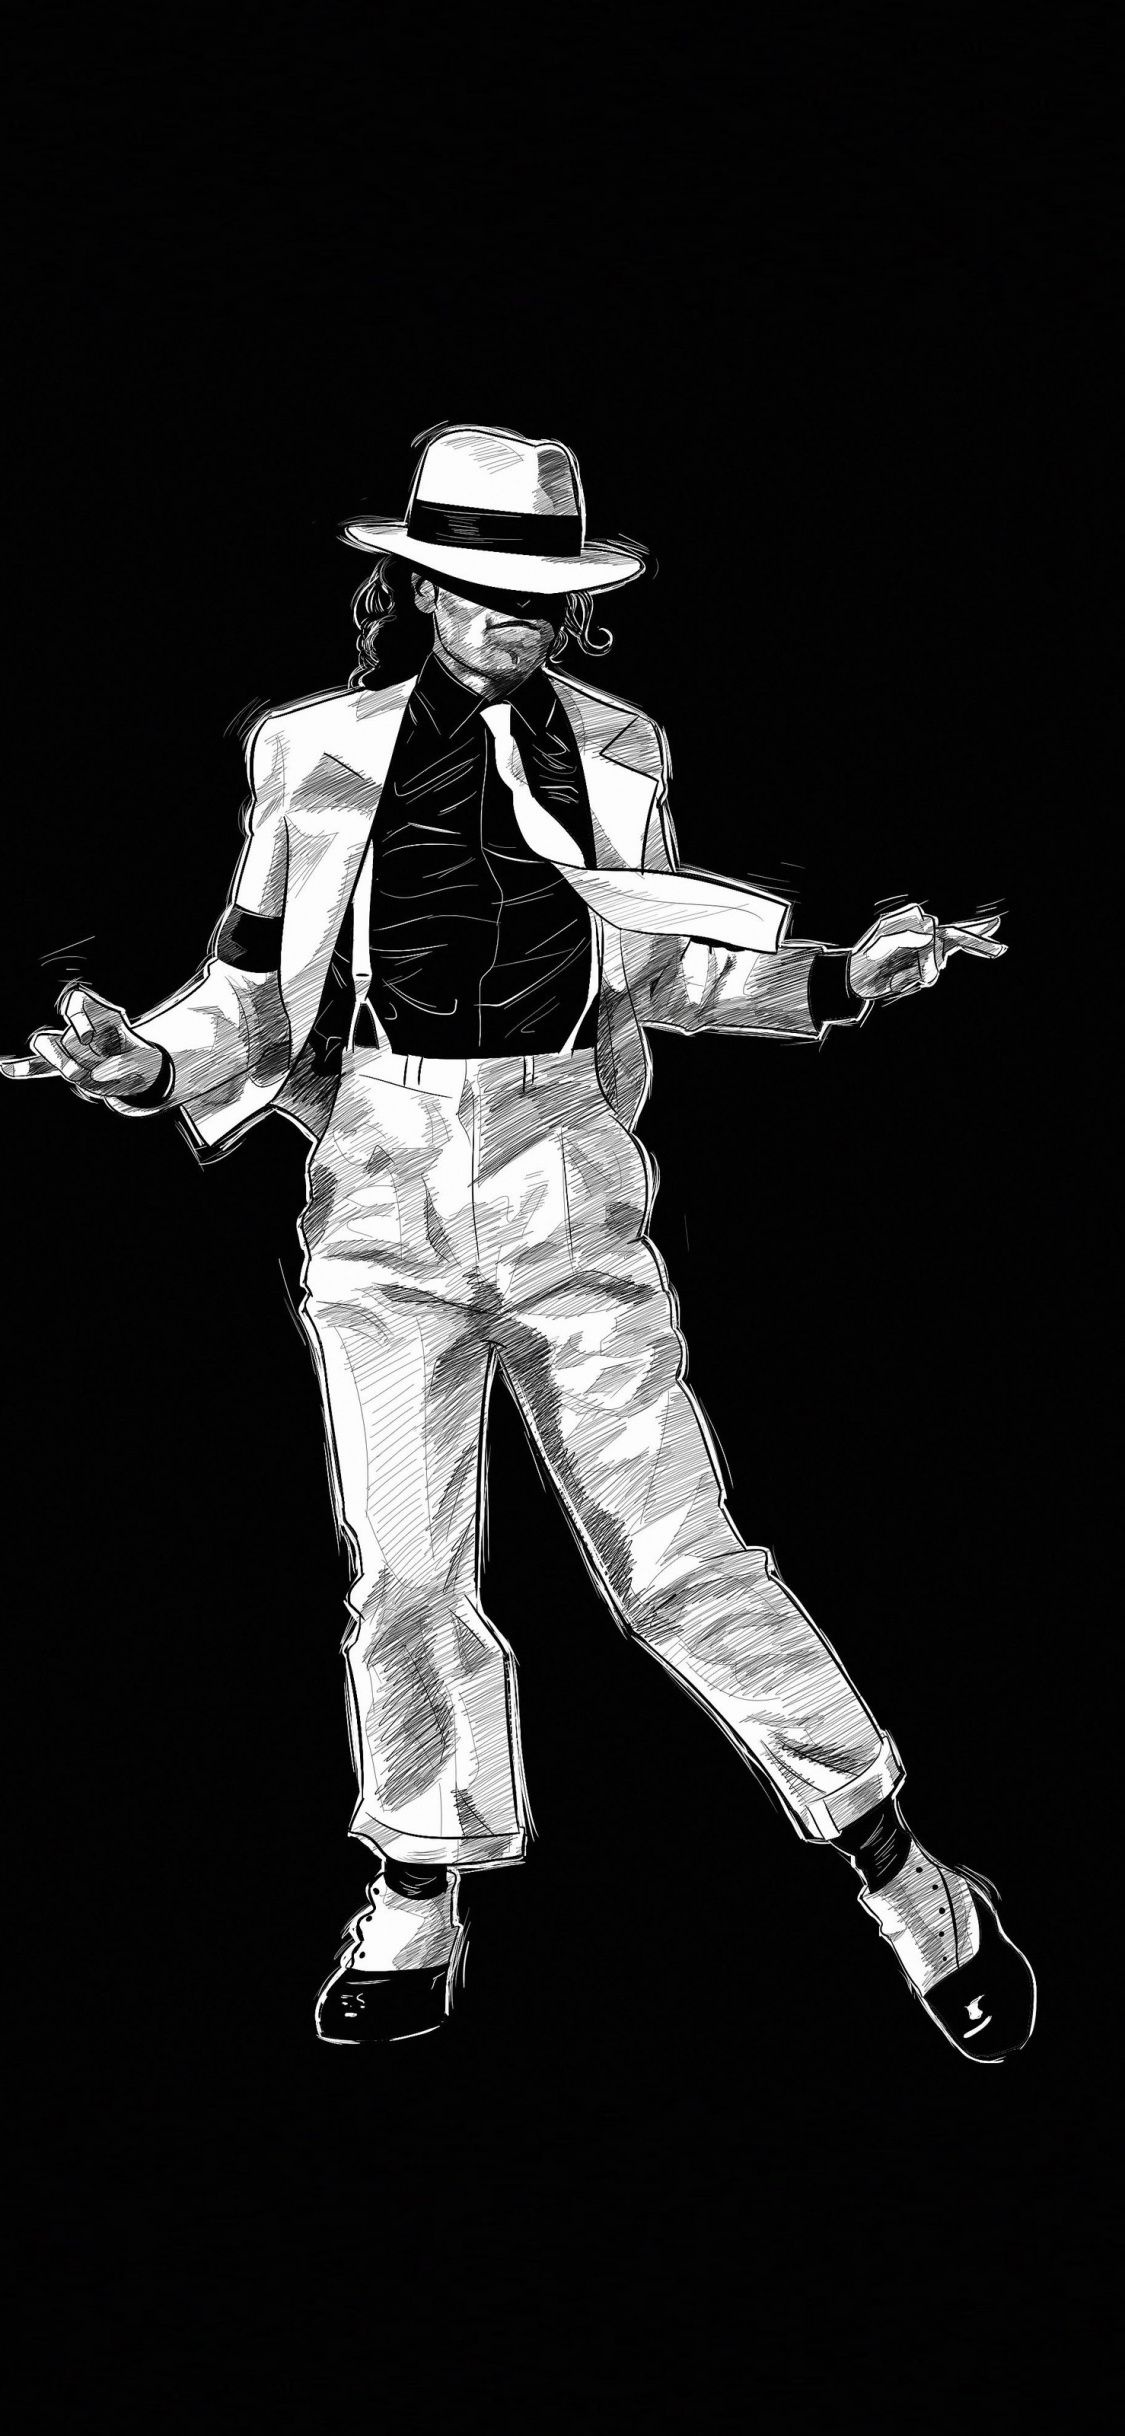 Art, dark, Michael Jackson, 1125x2436 wallpaper Michael